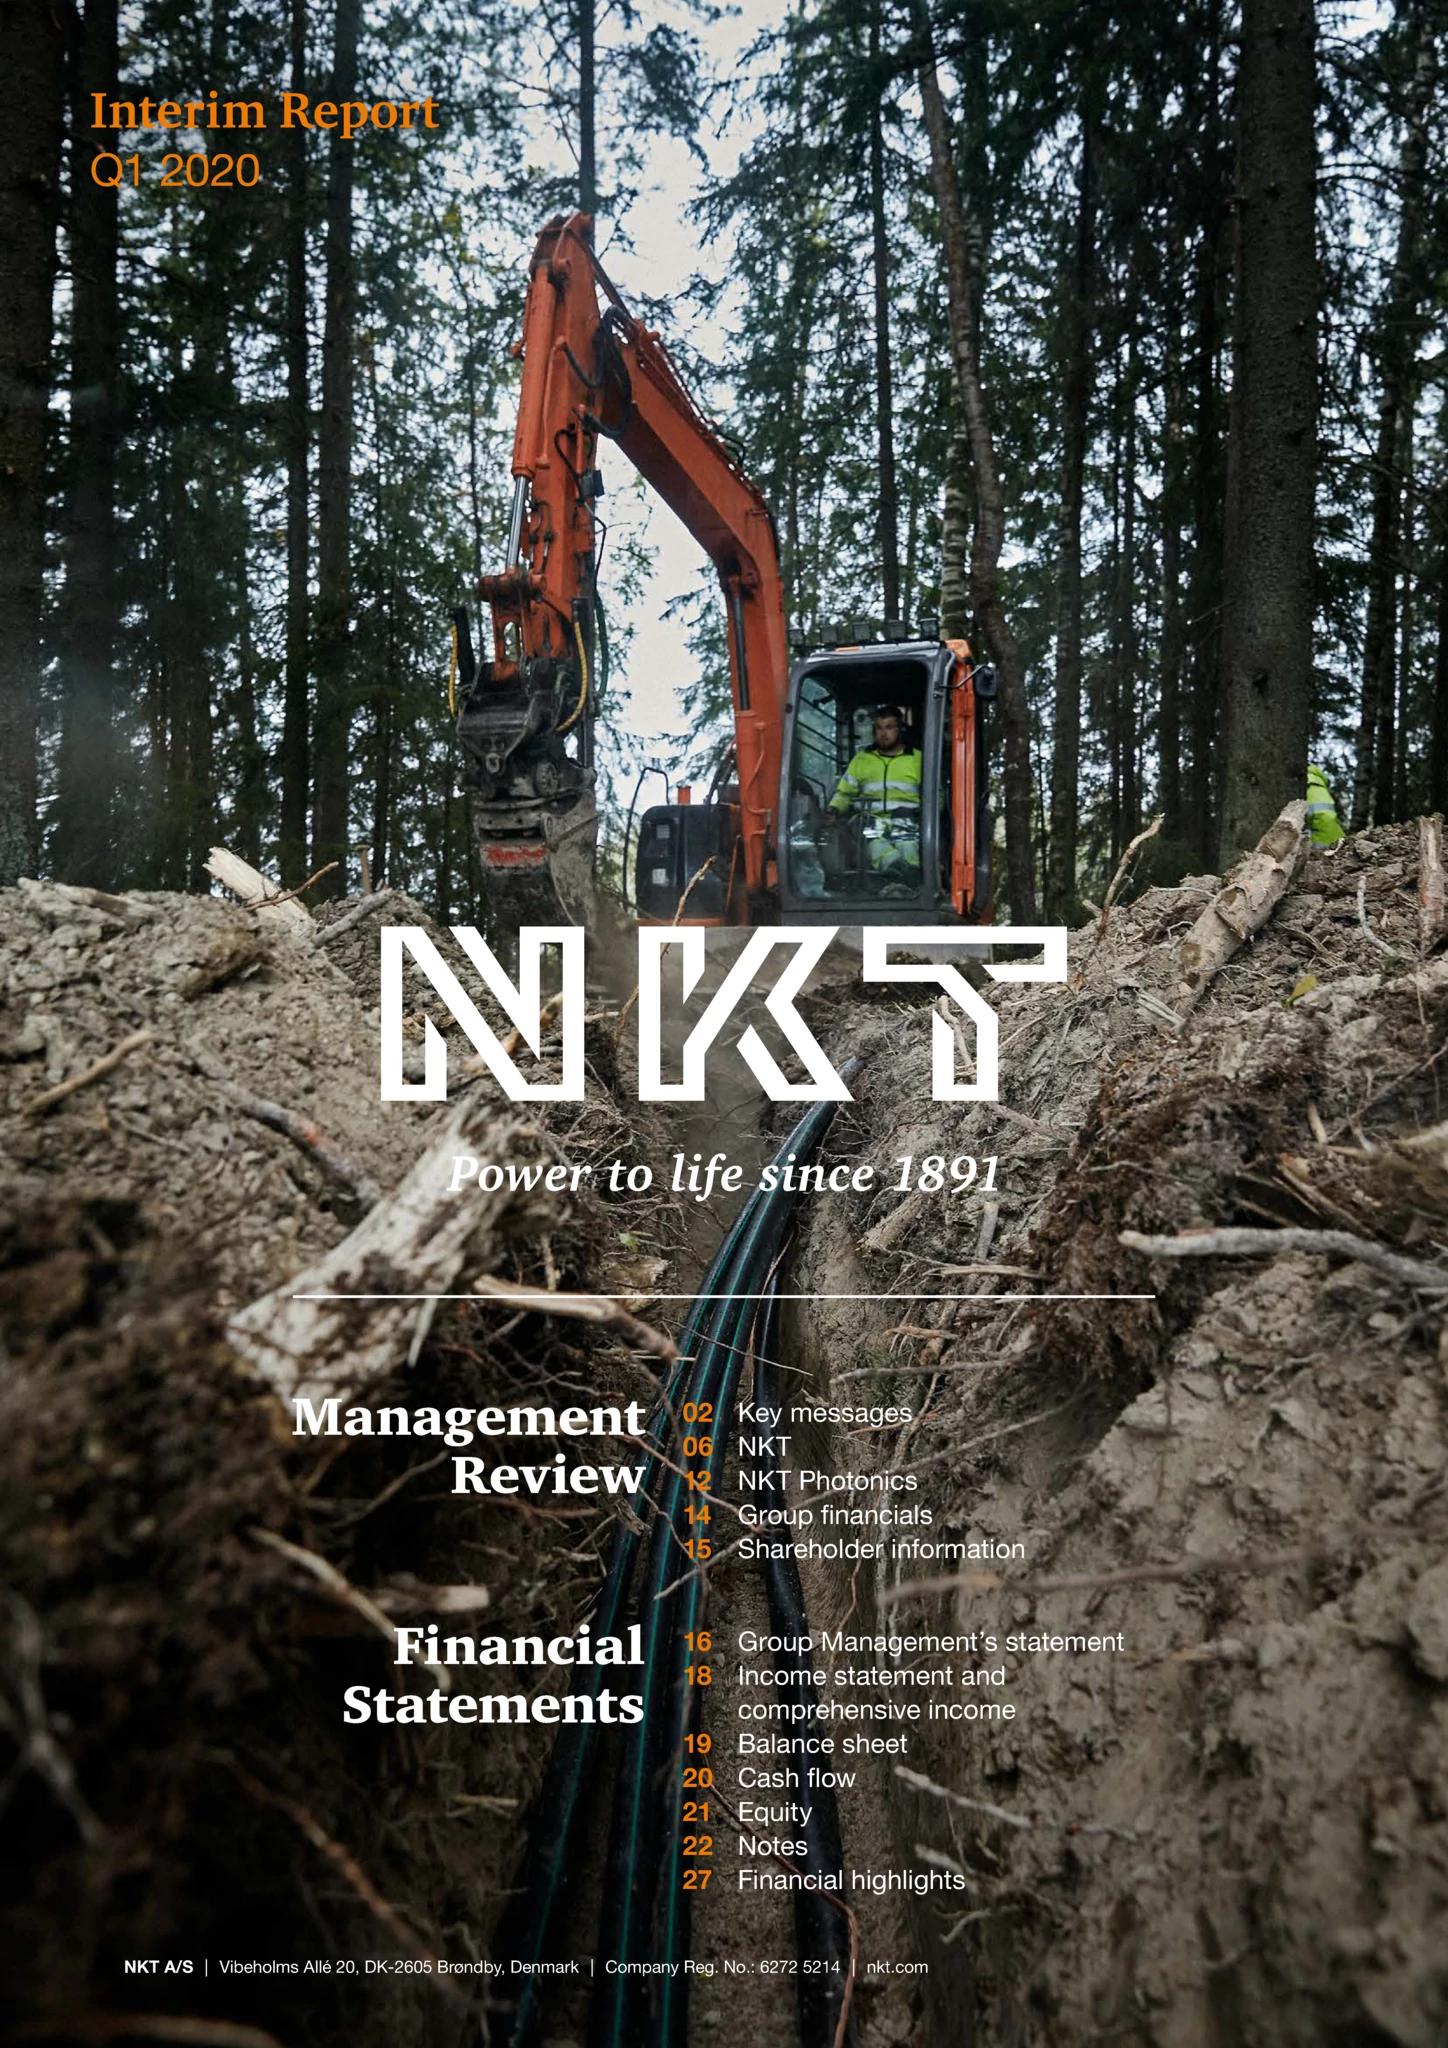 NKT_Interim_Report_Q1_2020_200513.pdf